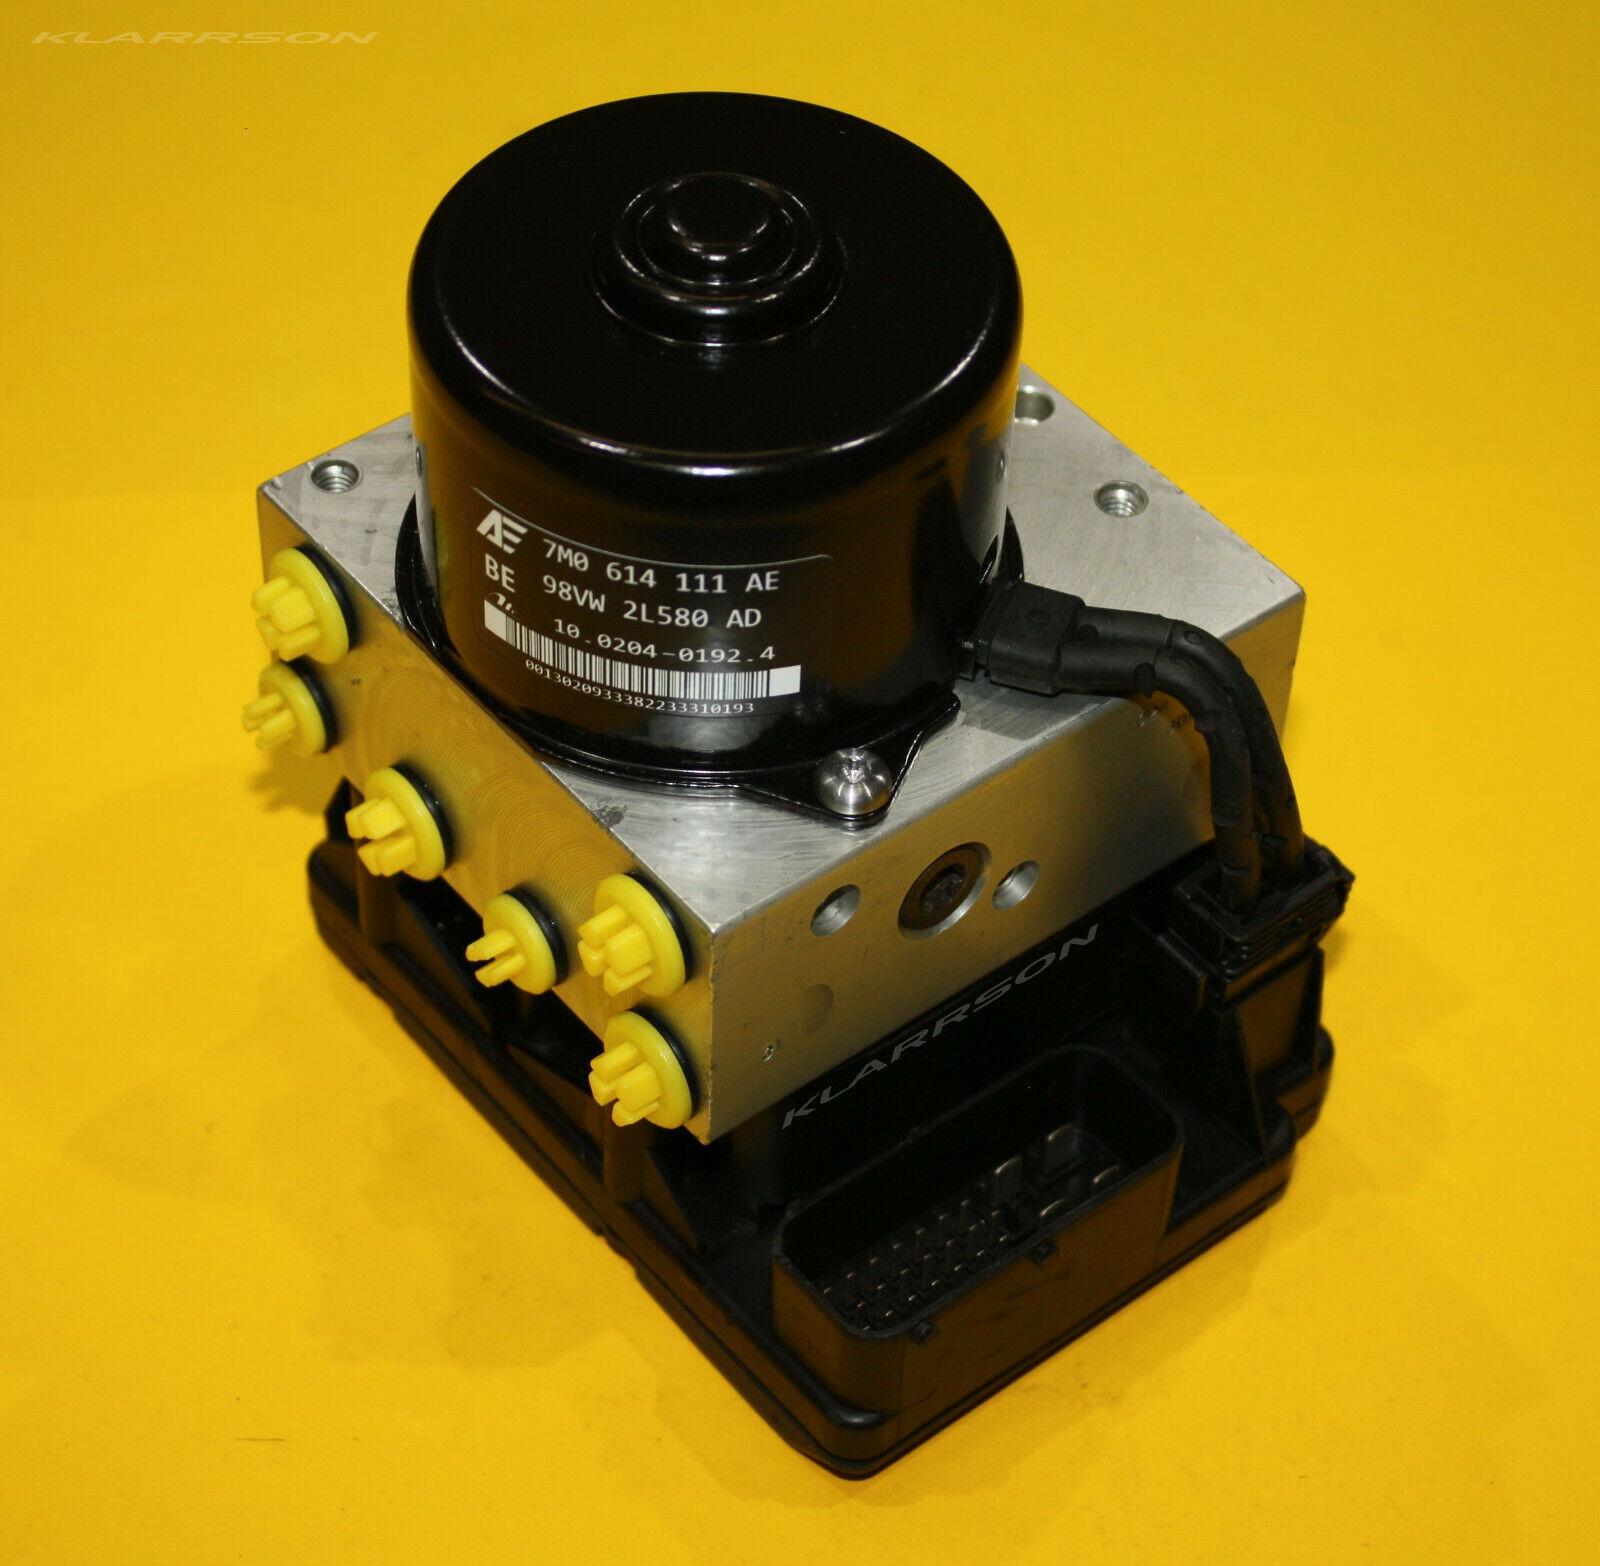 ⭐⭐⭐ ABS Steuergerät Hydraulikblock  7M3614111M 7M3907379E 7M3 907 379 E VW ⭐⭐⭐